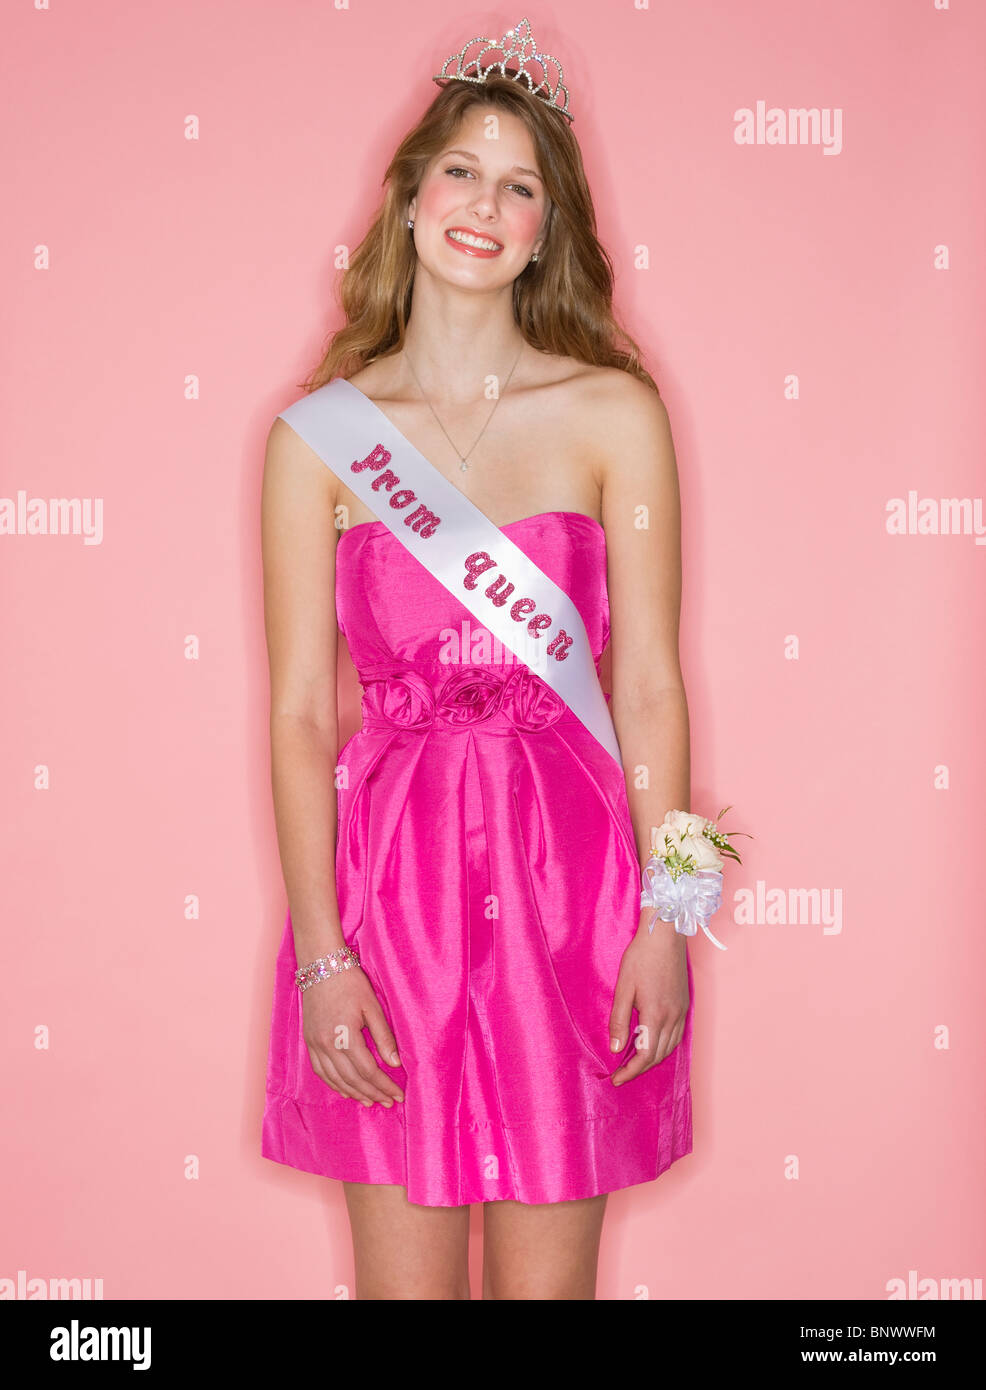 Asombroso Distrito De La Moda Viste La Prom Embellecimiento - Ideas ...